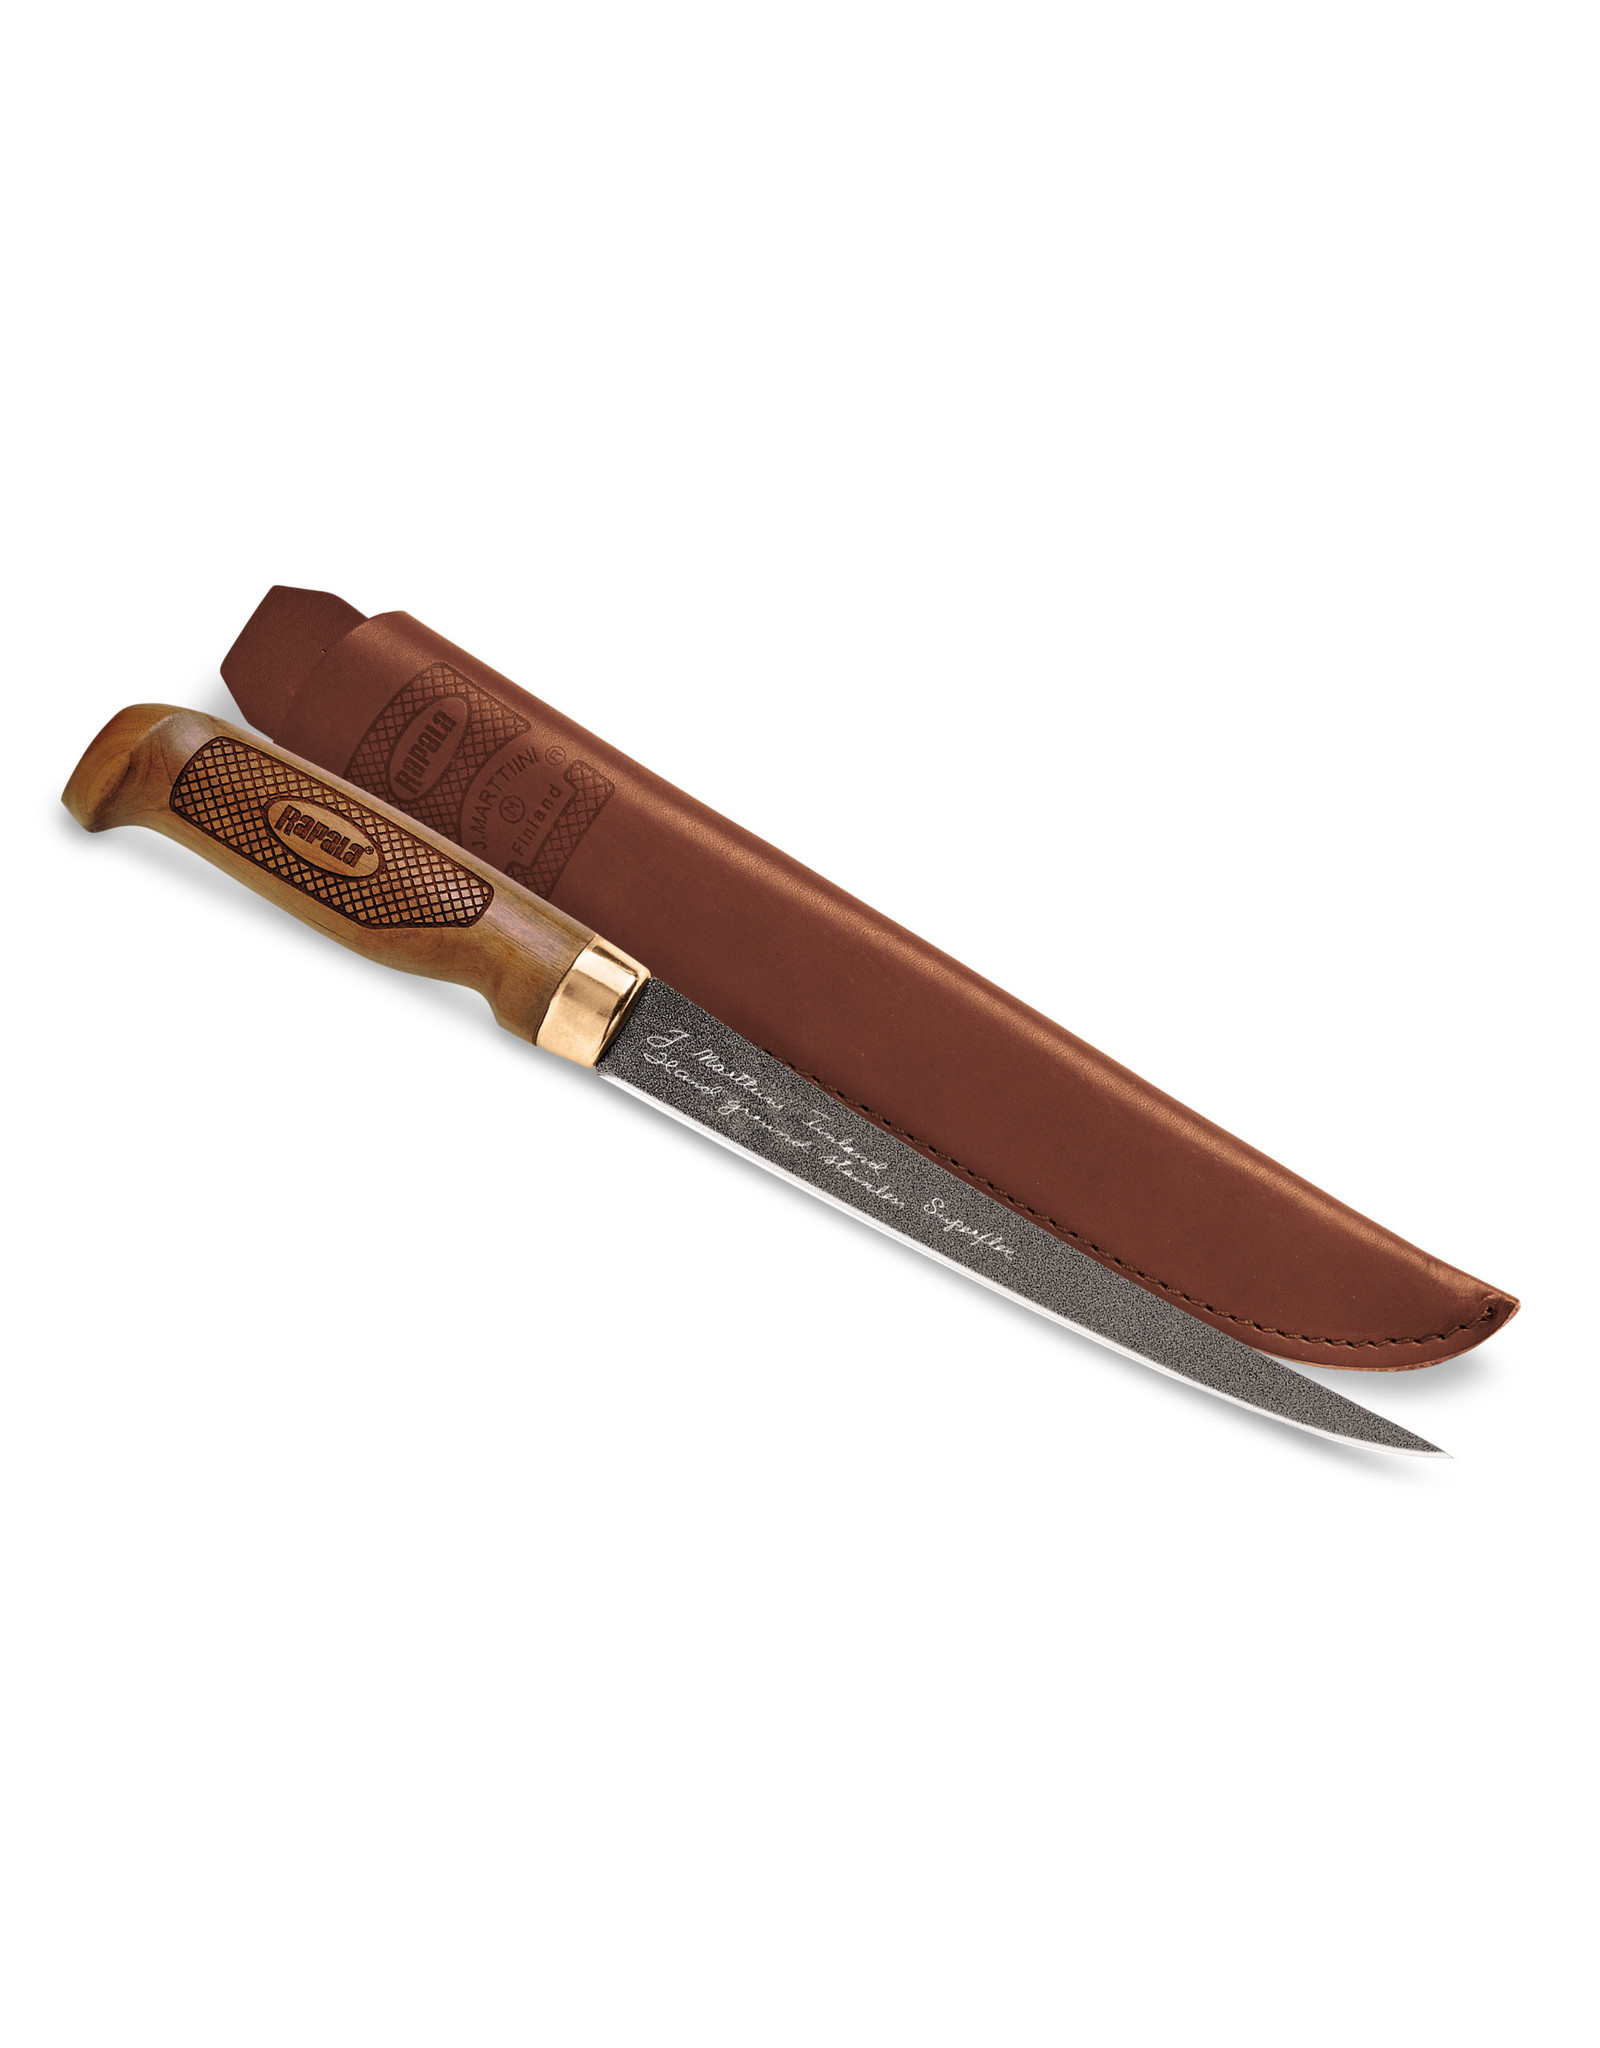 Rapala Rapala Fish 'n Fillet Superflex Knife